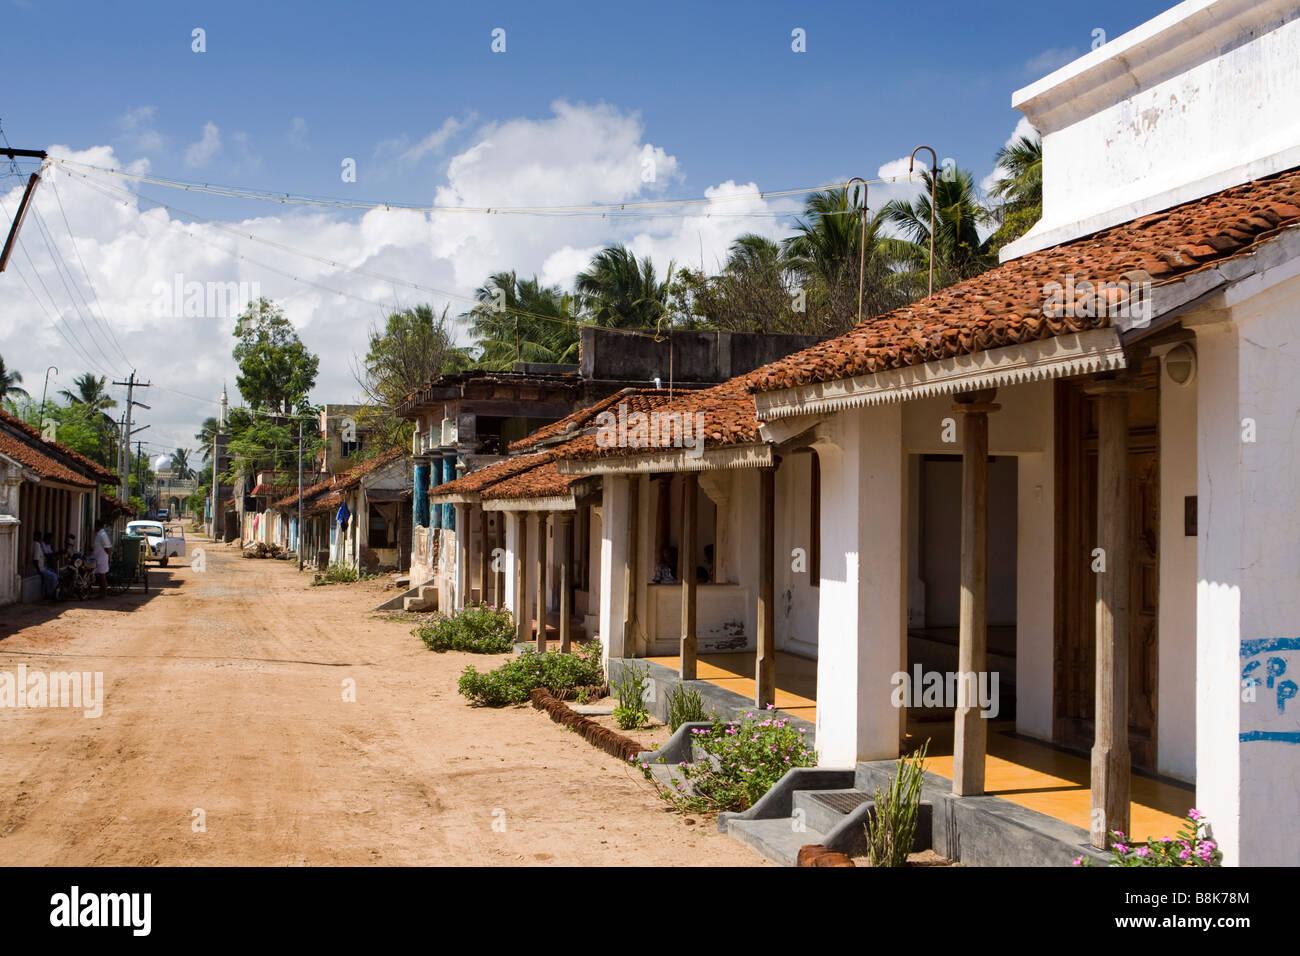 India Tamil Nadu Tranquebar Tharangambadi village street of small local houses - Stock Image